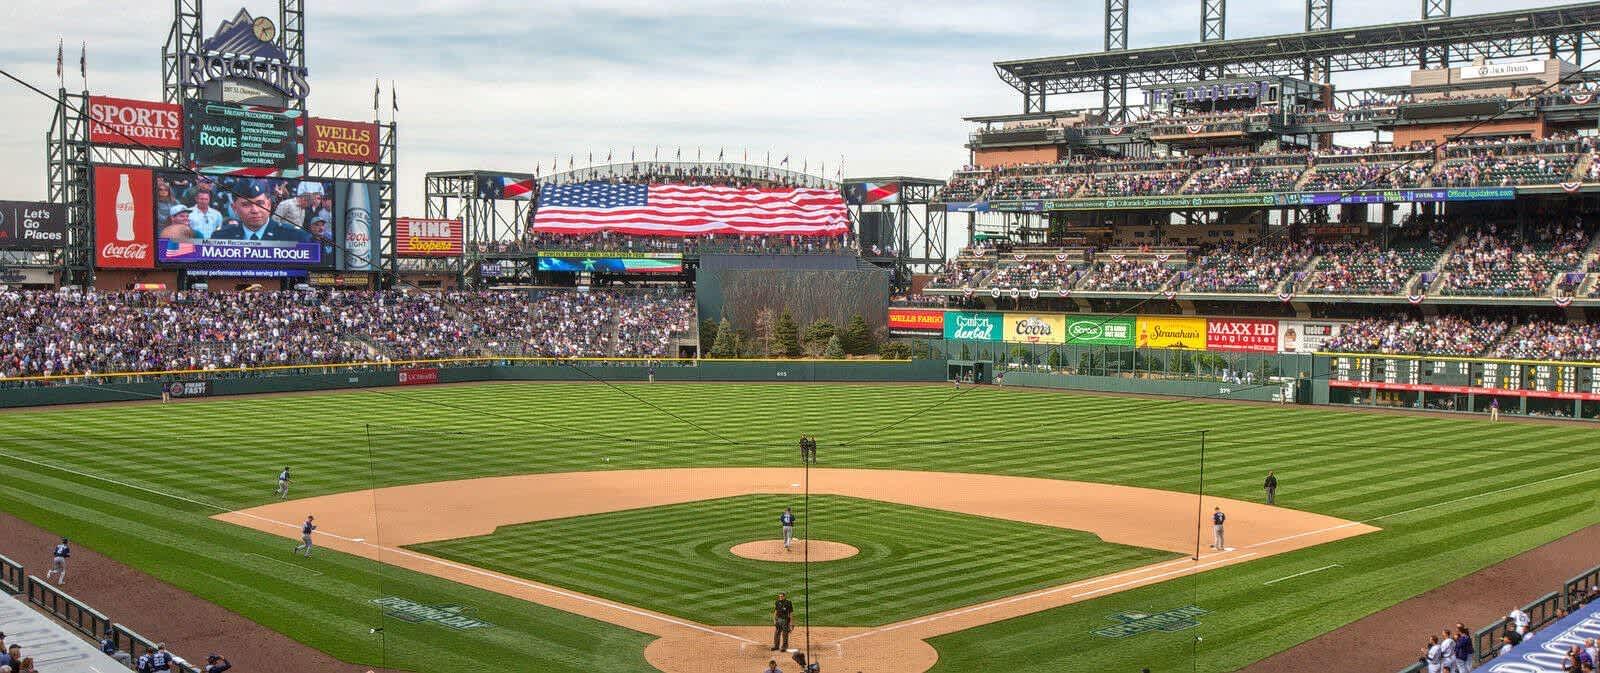 Colorado Rockies Vs Los Angeles Dodgers 4 3 2021 Tickets Stubhub